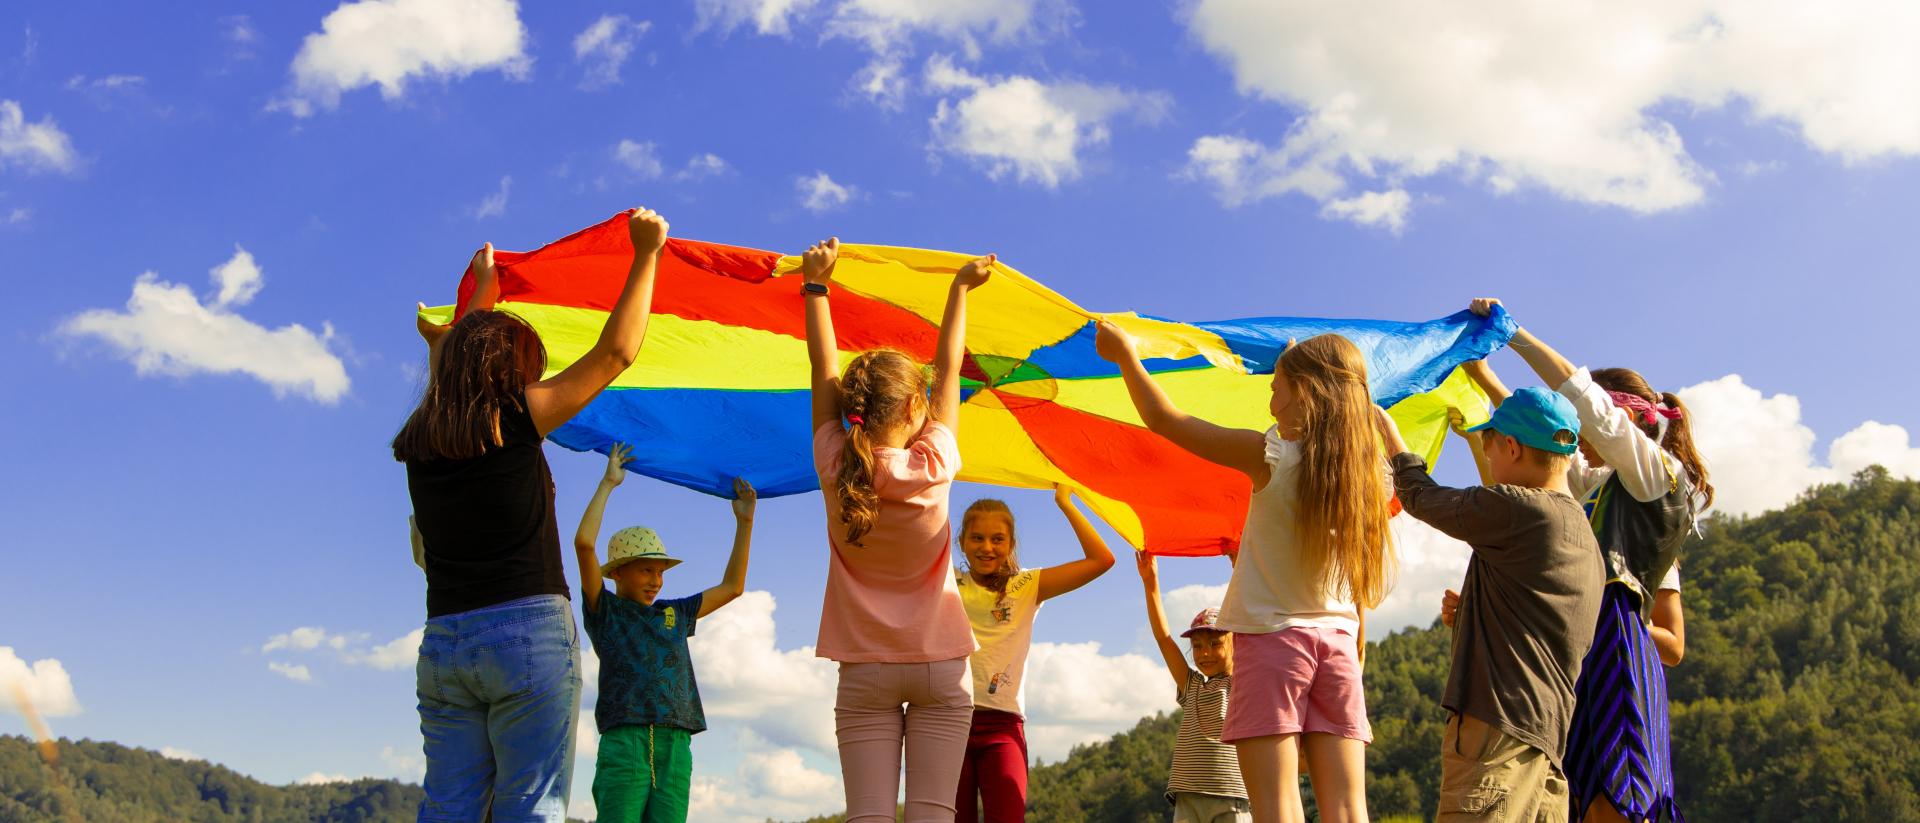 Kinder mit buntem Stoff